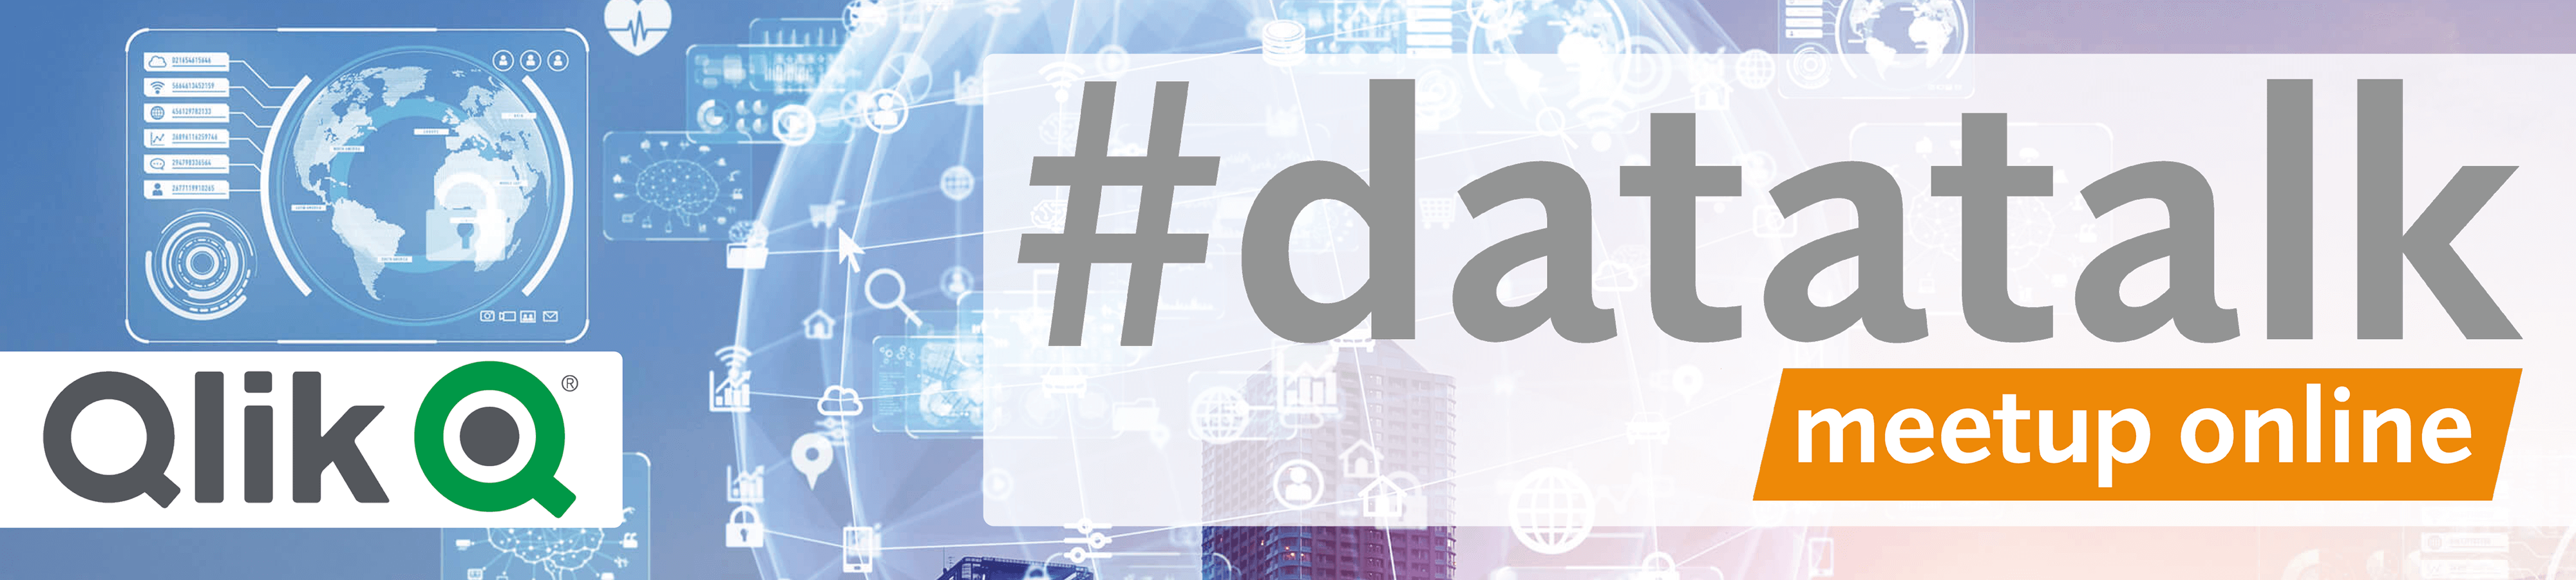 #datatalk Meetup Online Banner